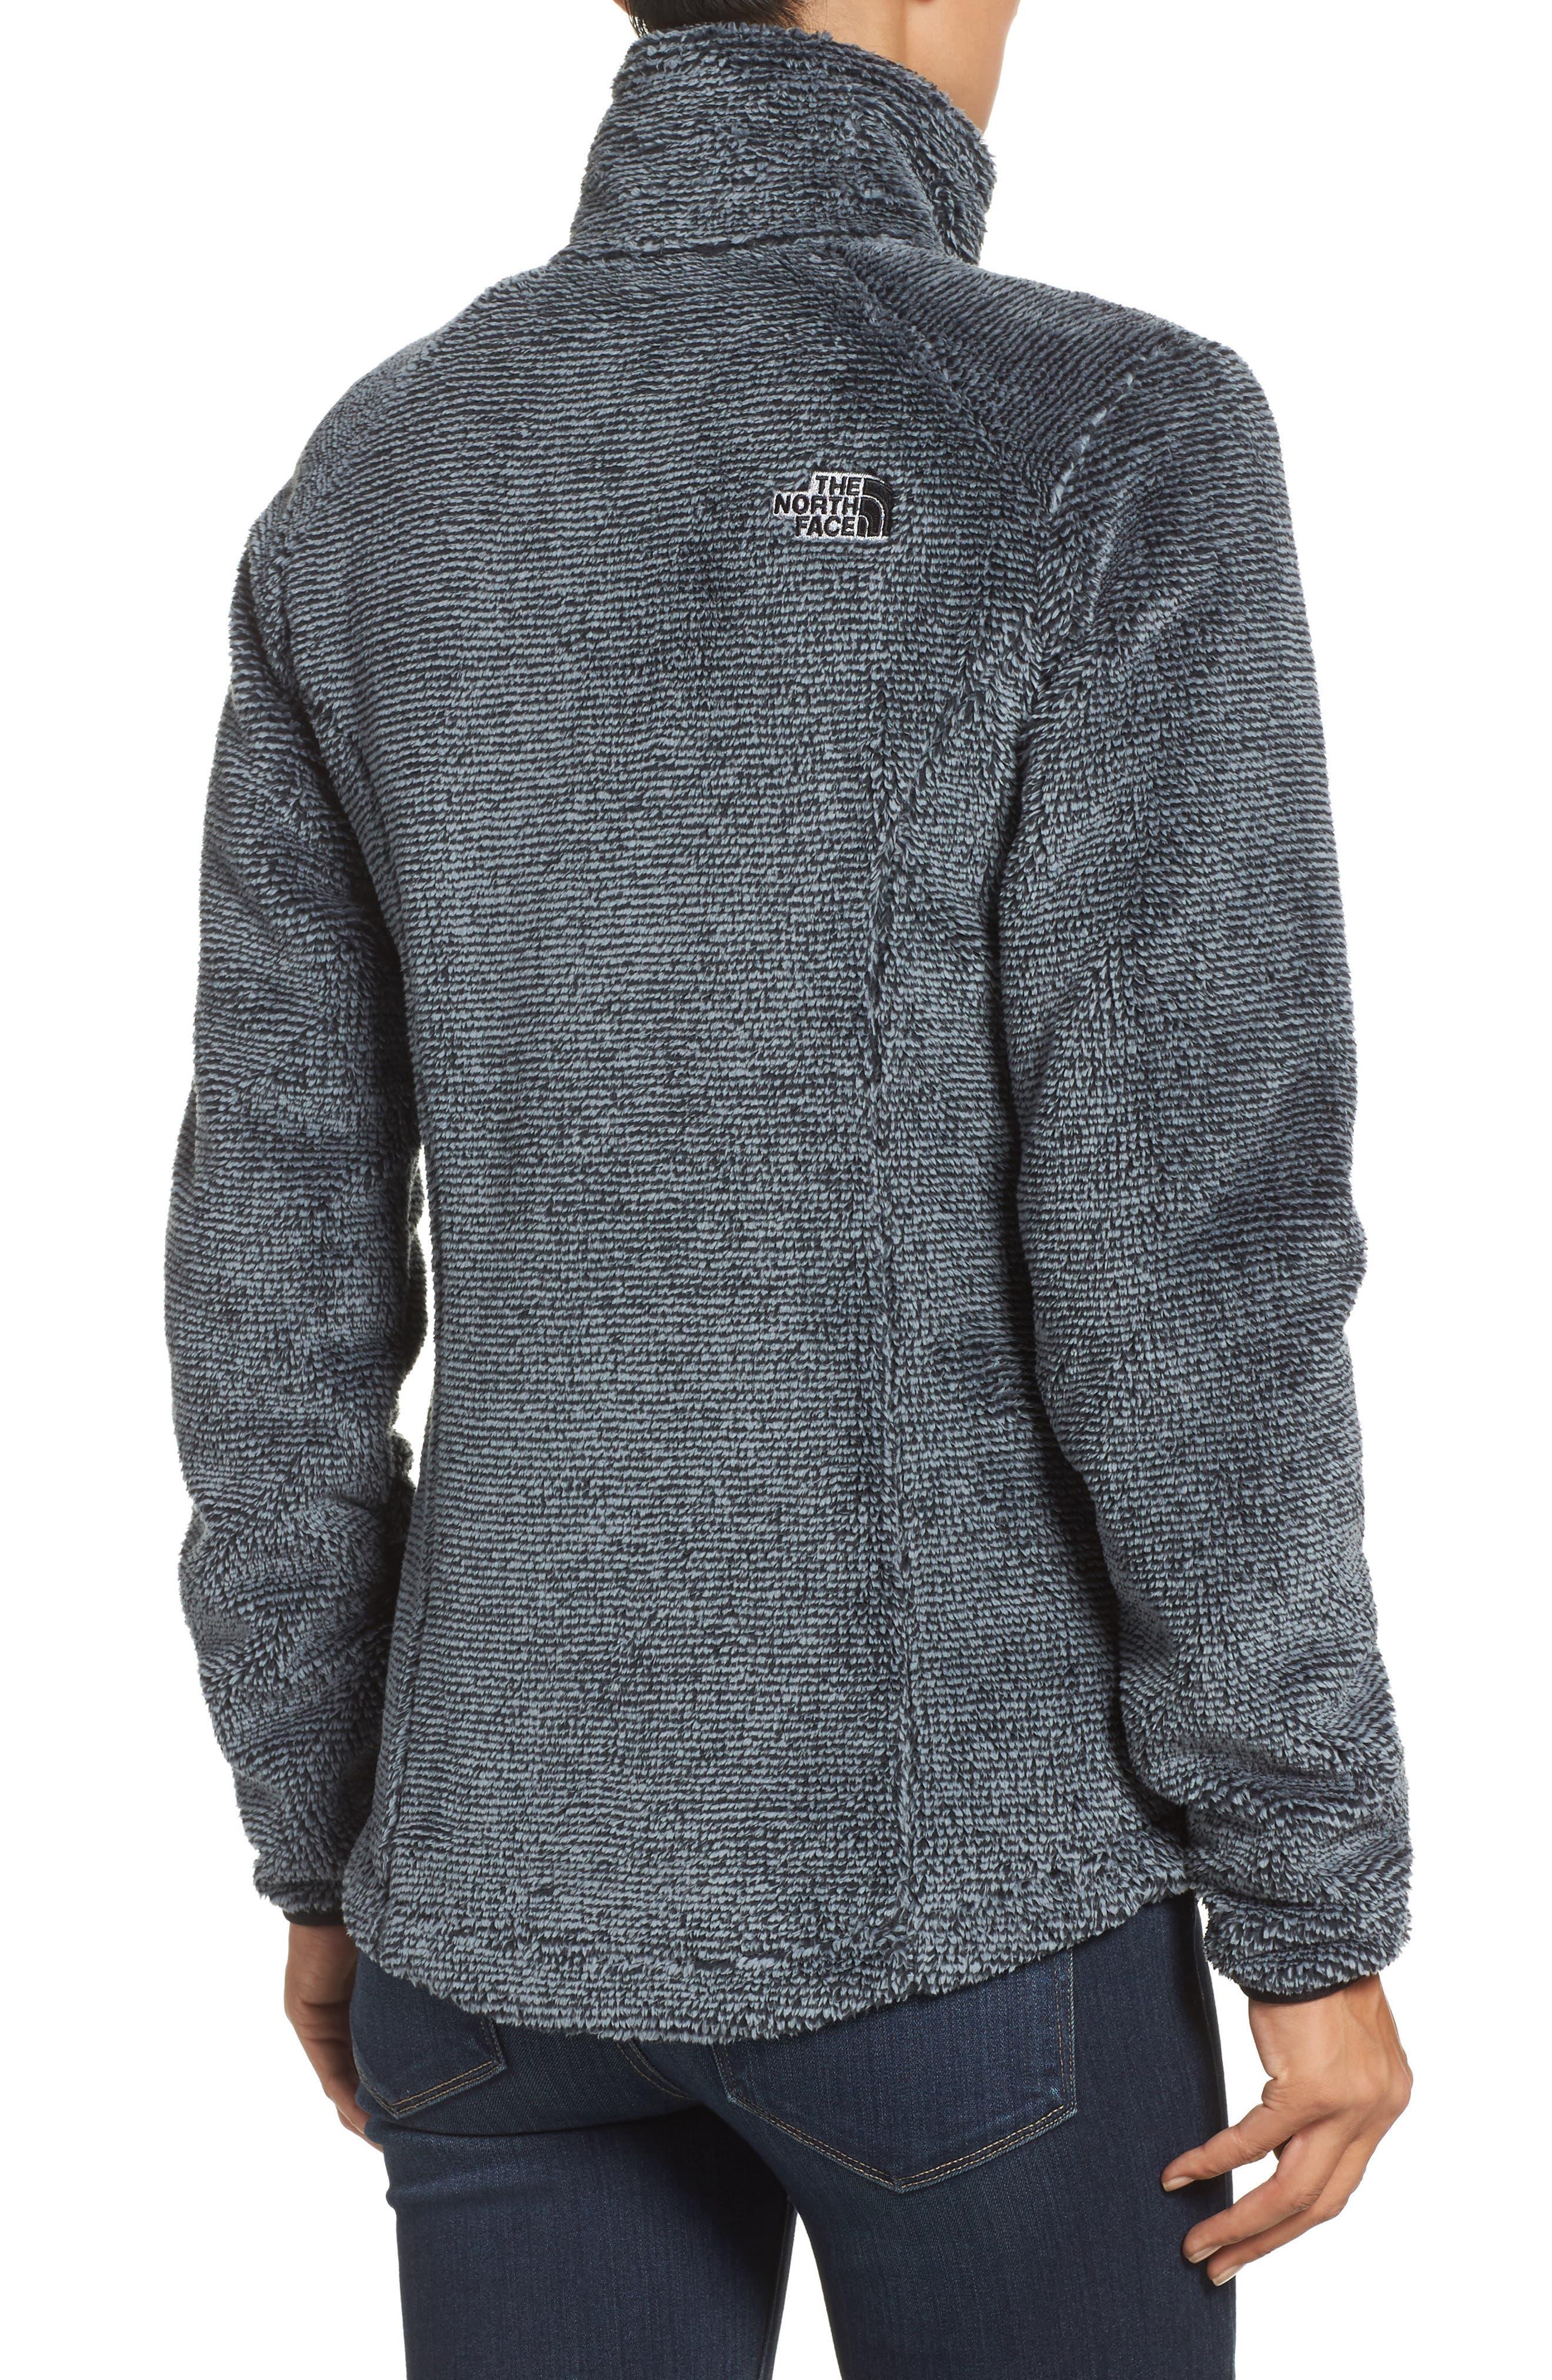 'Osito 2' Jacket,                             Alternate thumbnail 2, color,                             Tnf Black/ Mid Grey Stripe